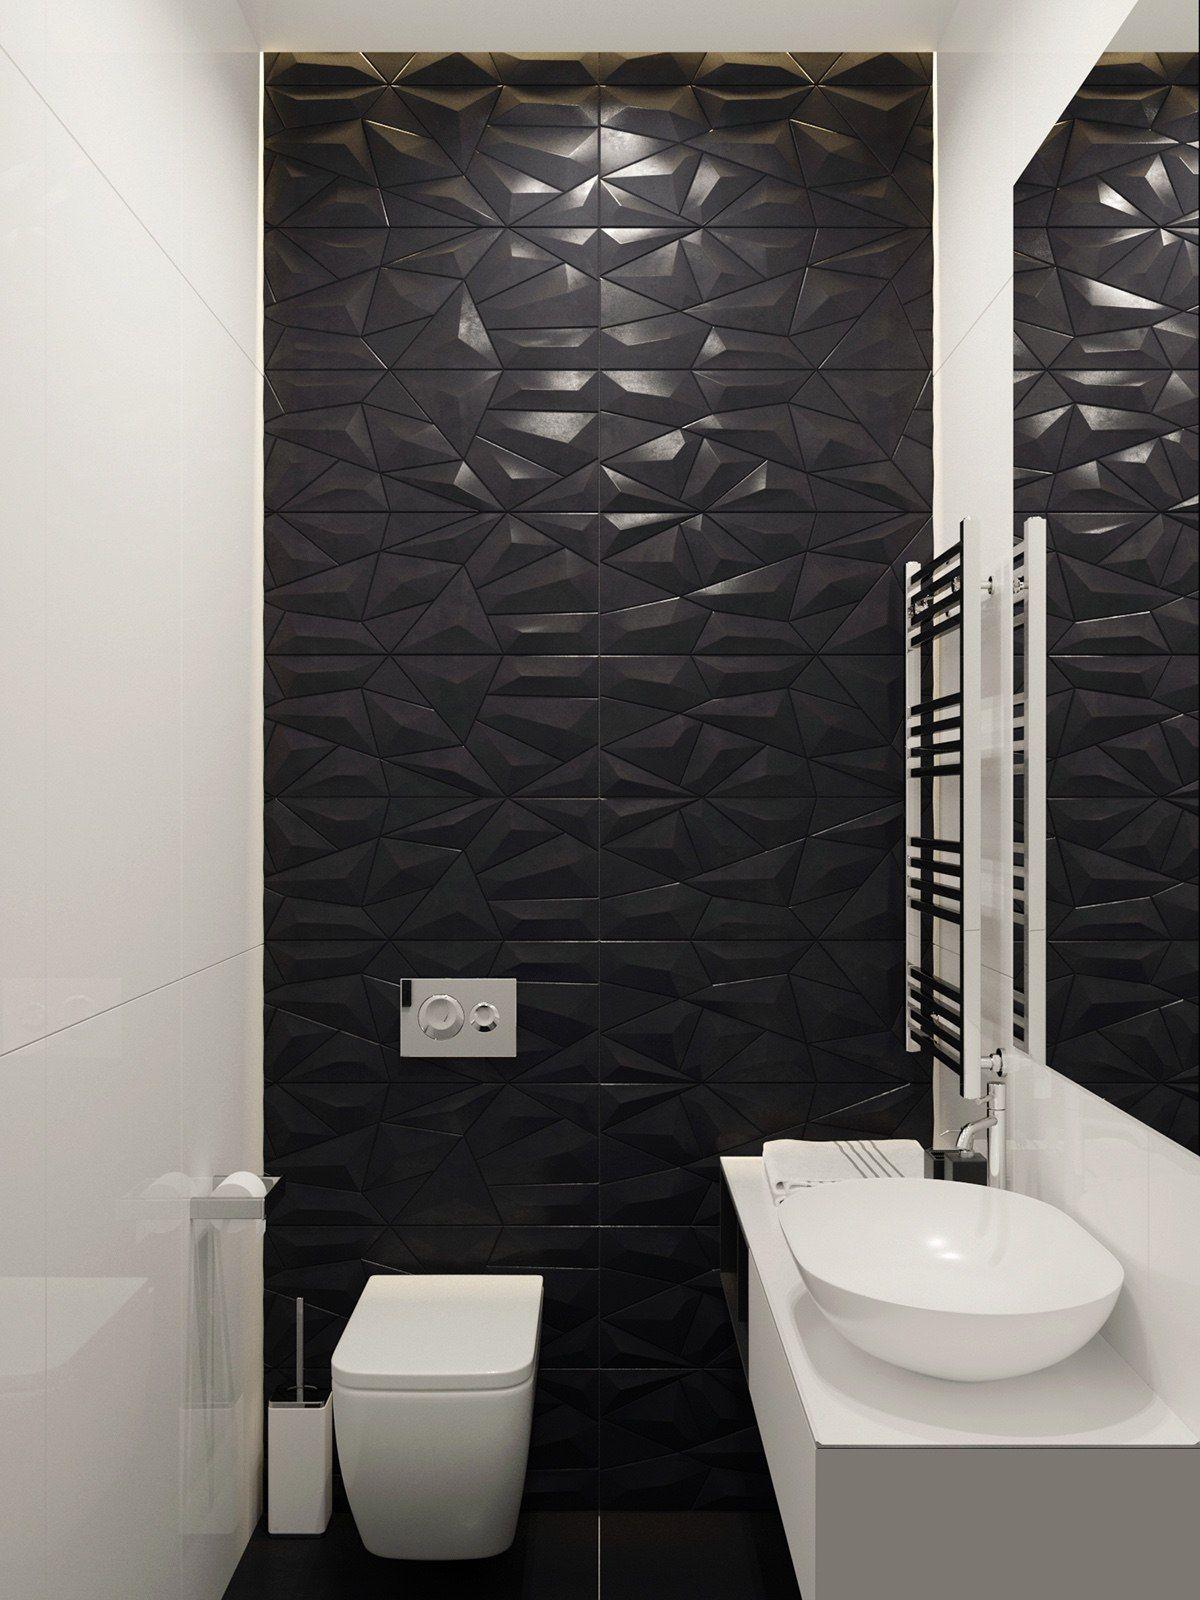 Interior Designer Bathroom Mesmerizing Home Designing — Via Hexagonal Black Feature Wall Bathroom Decorating Design